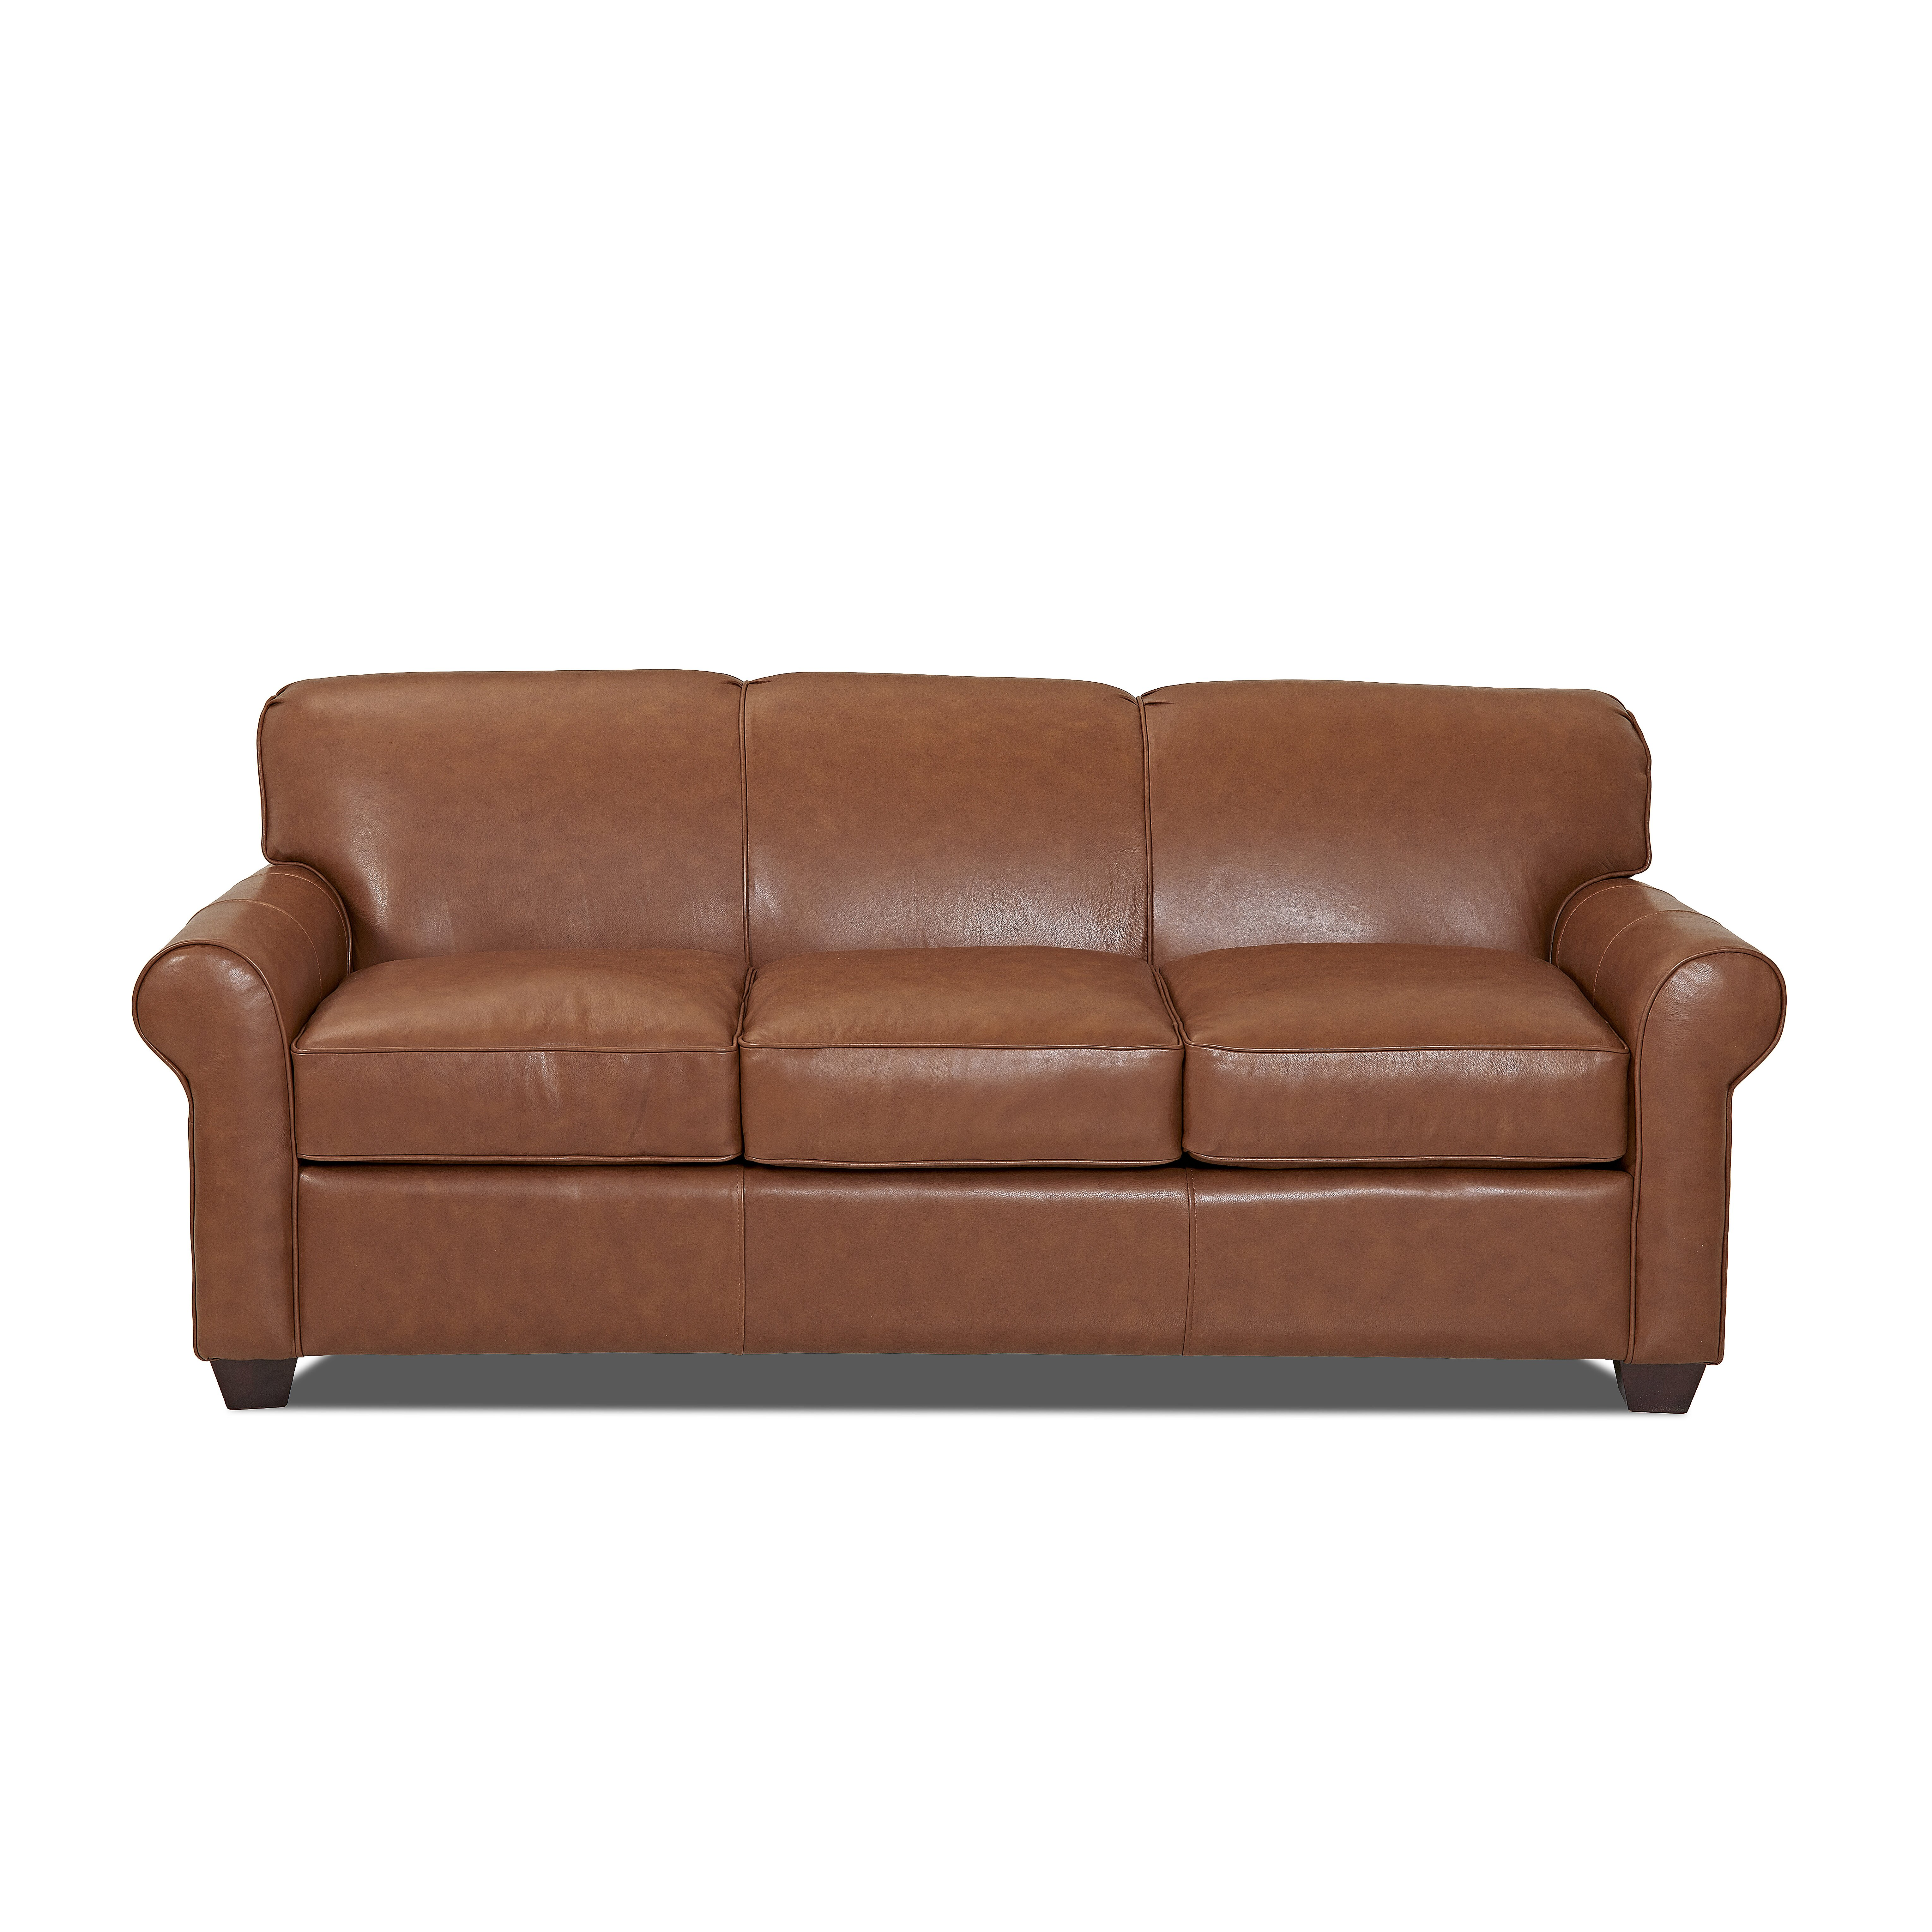 Wayfair Custom Upholstery Jennifer Leather Sleeper Sofa ...